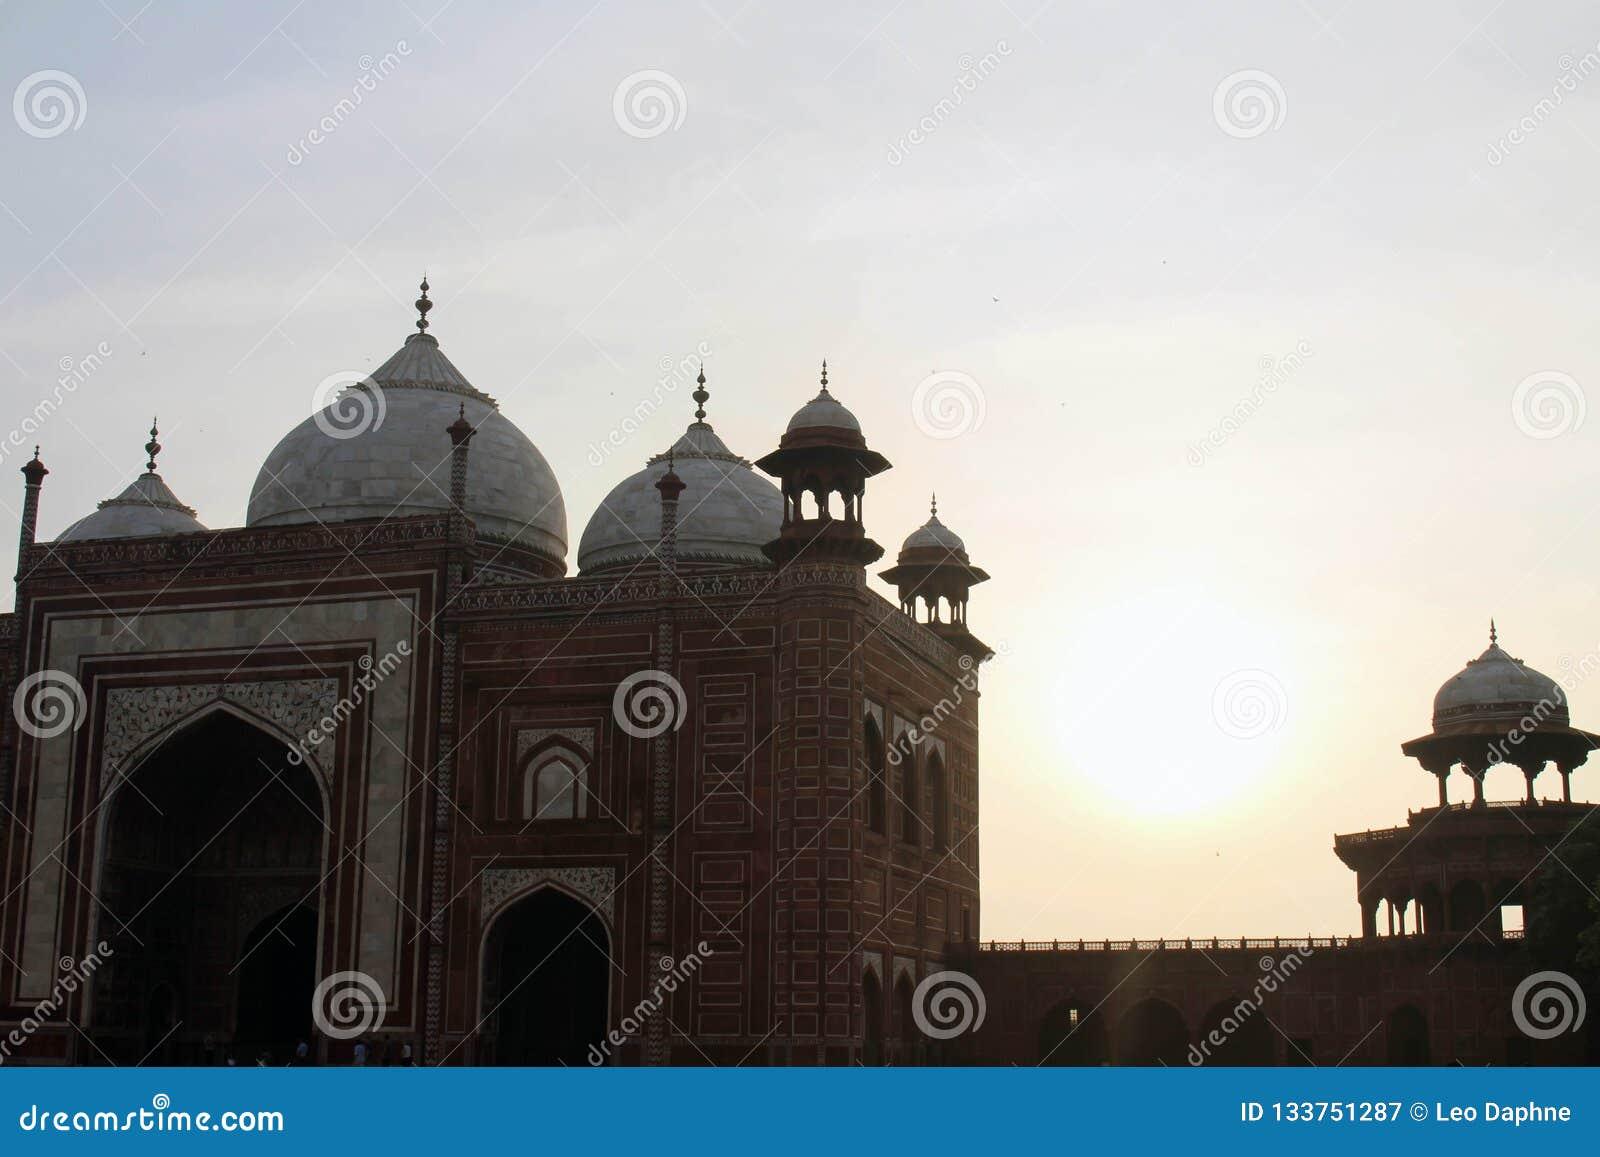 Het silhouet van Taj Mahal-torens tijdens zonsopgang